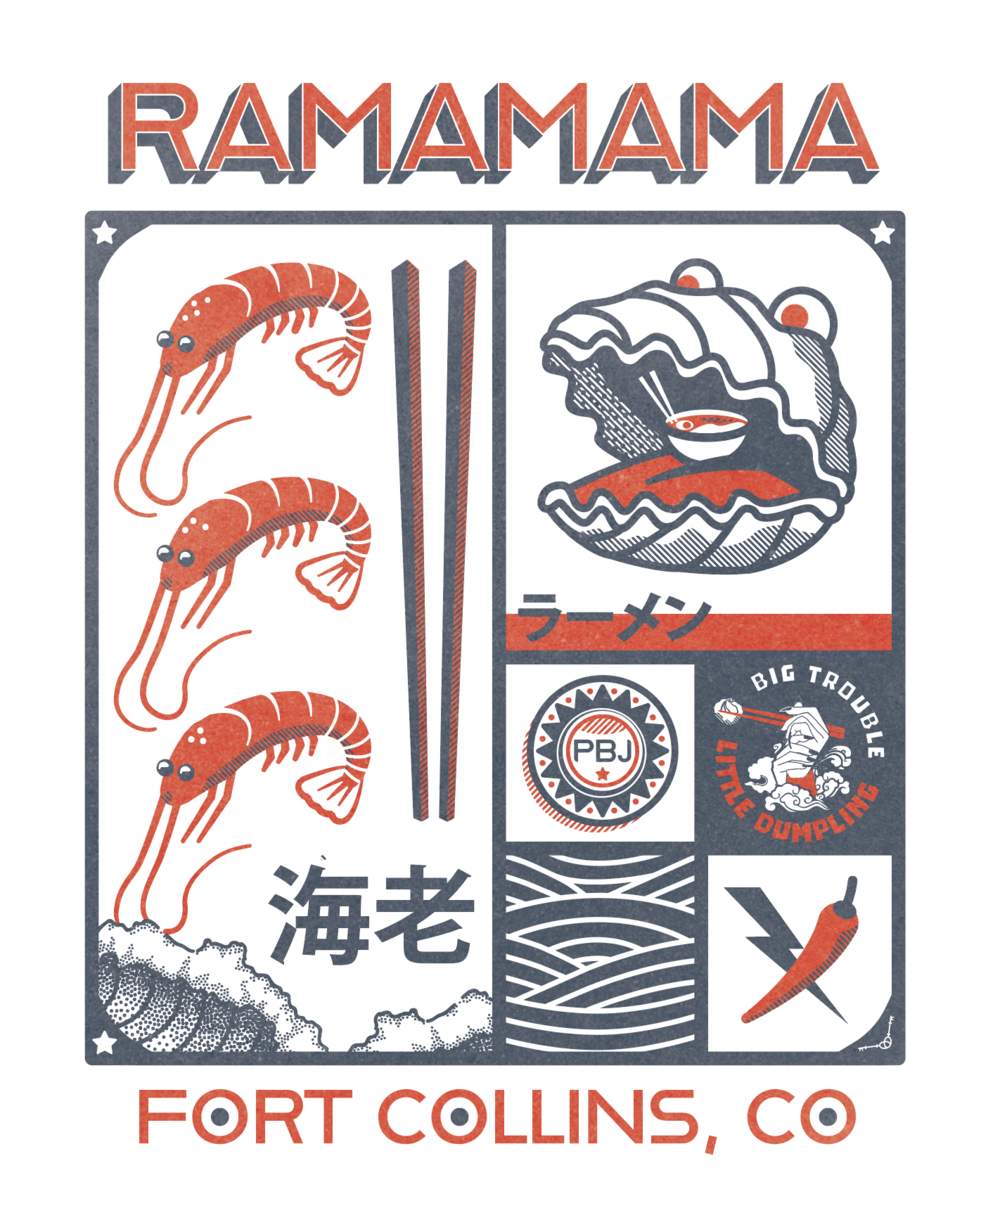 Limited Edition Ramamama Pop-up T shirt